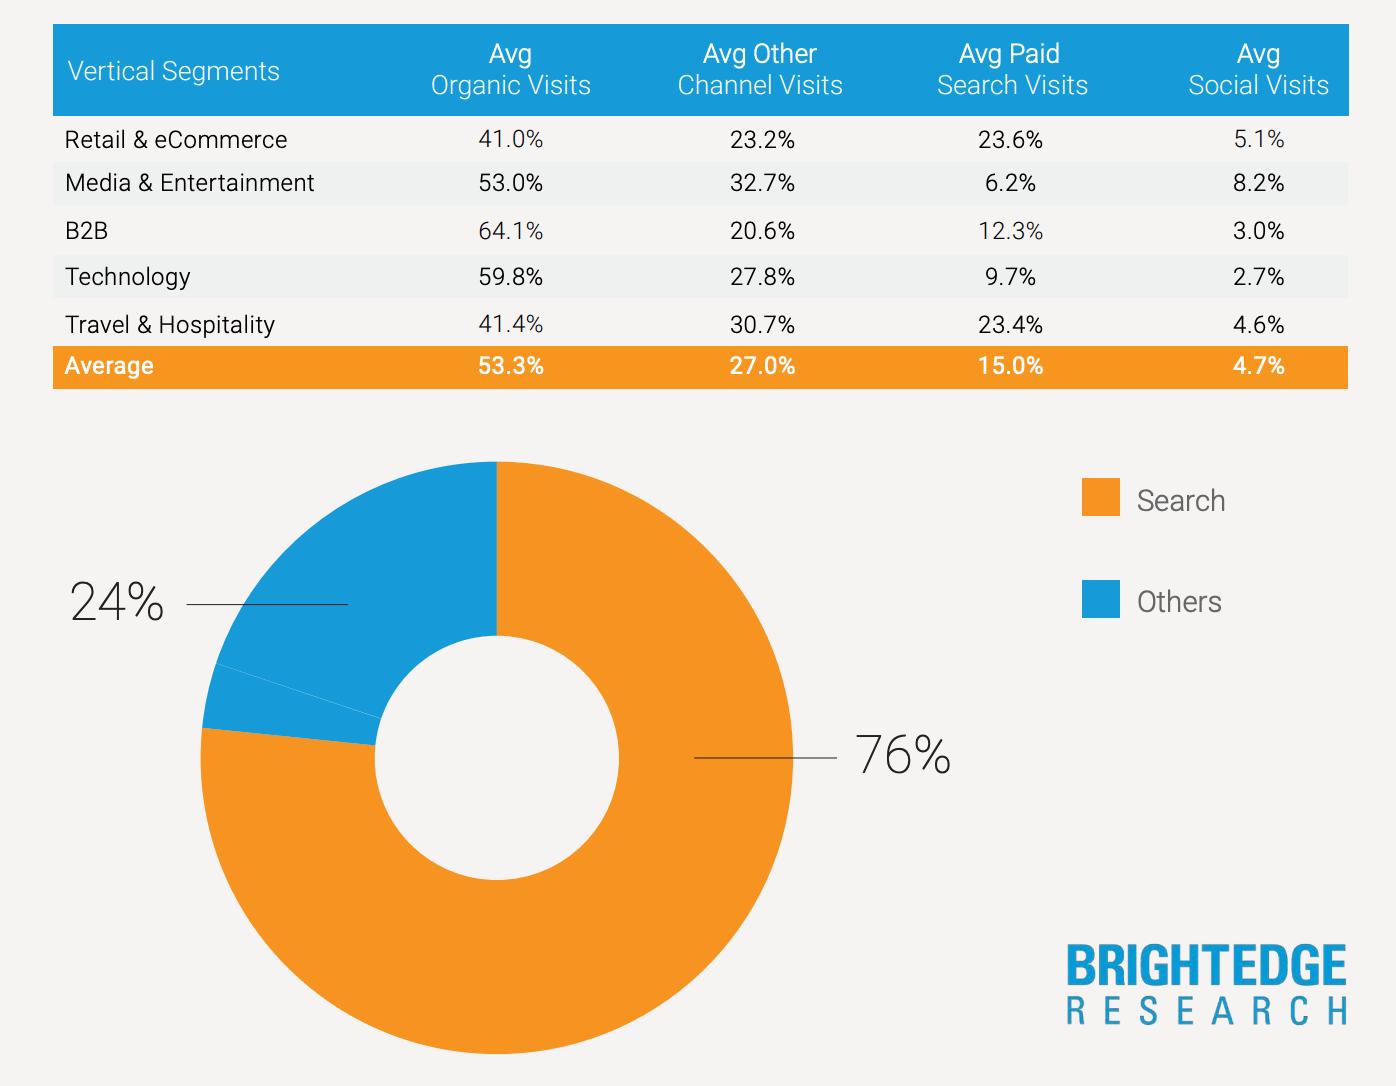 BrightEdge Research Vertical segments breakdown.